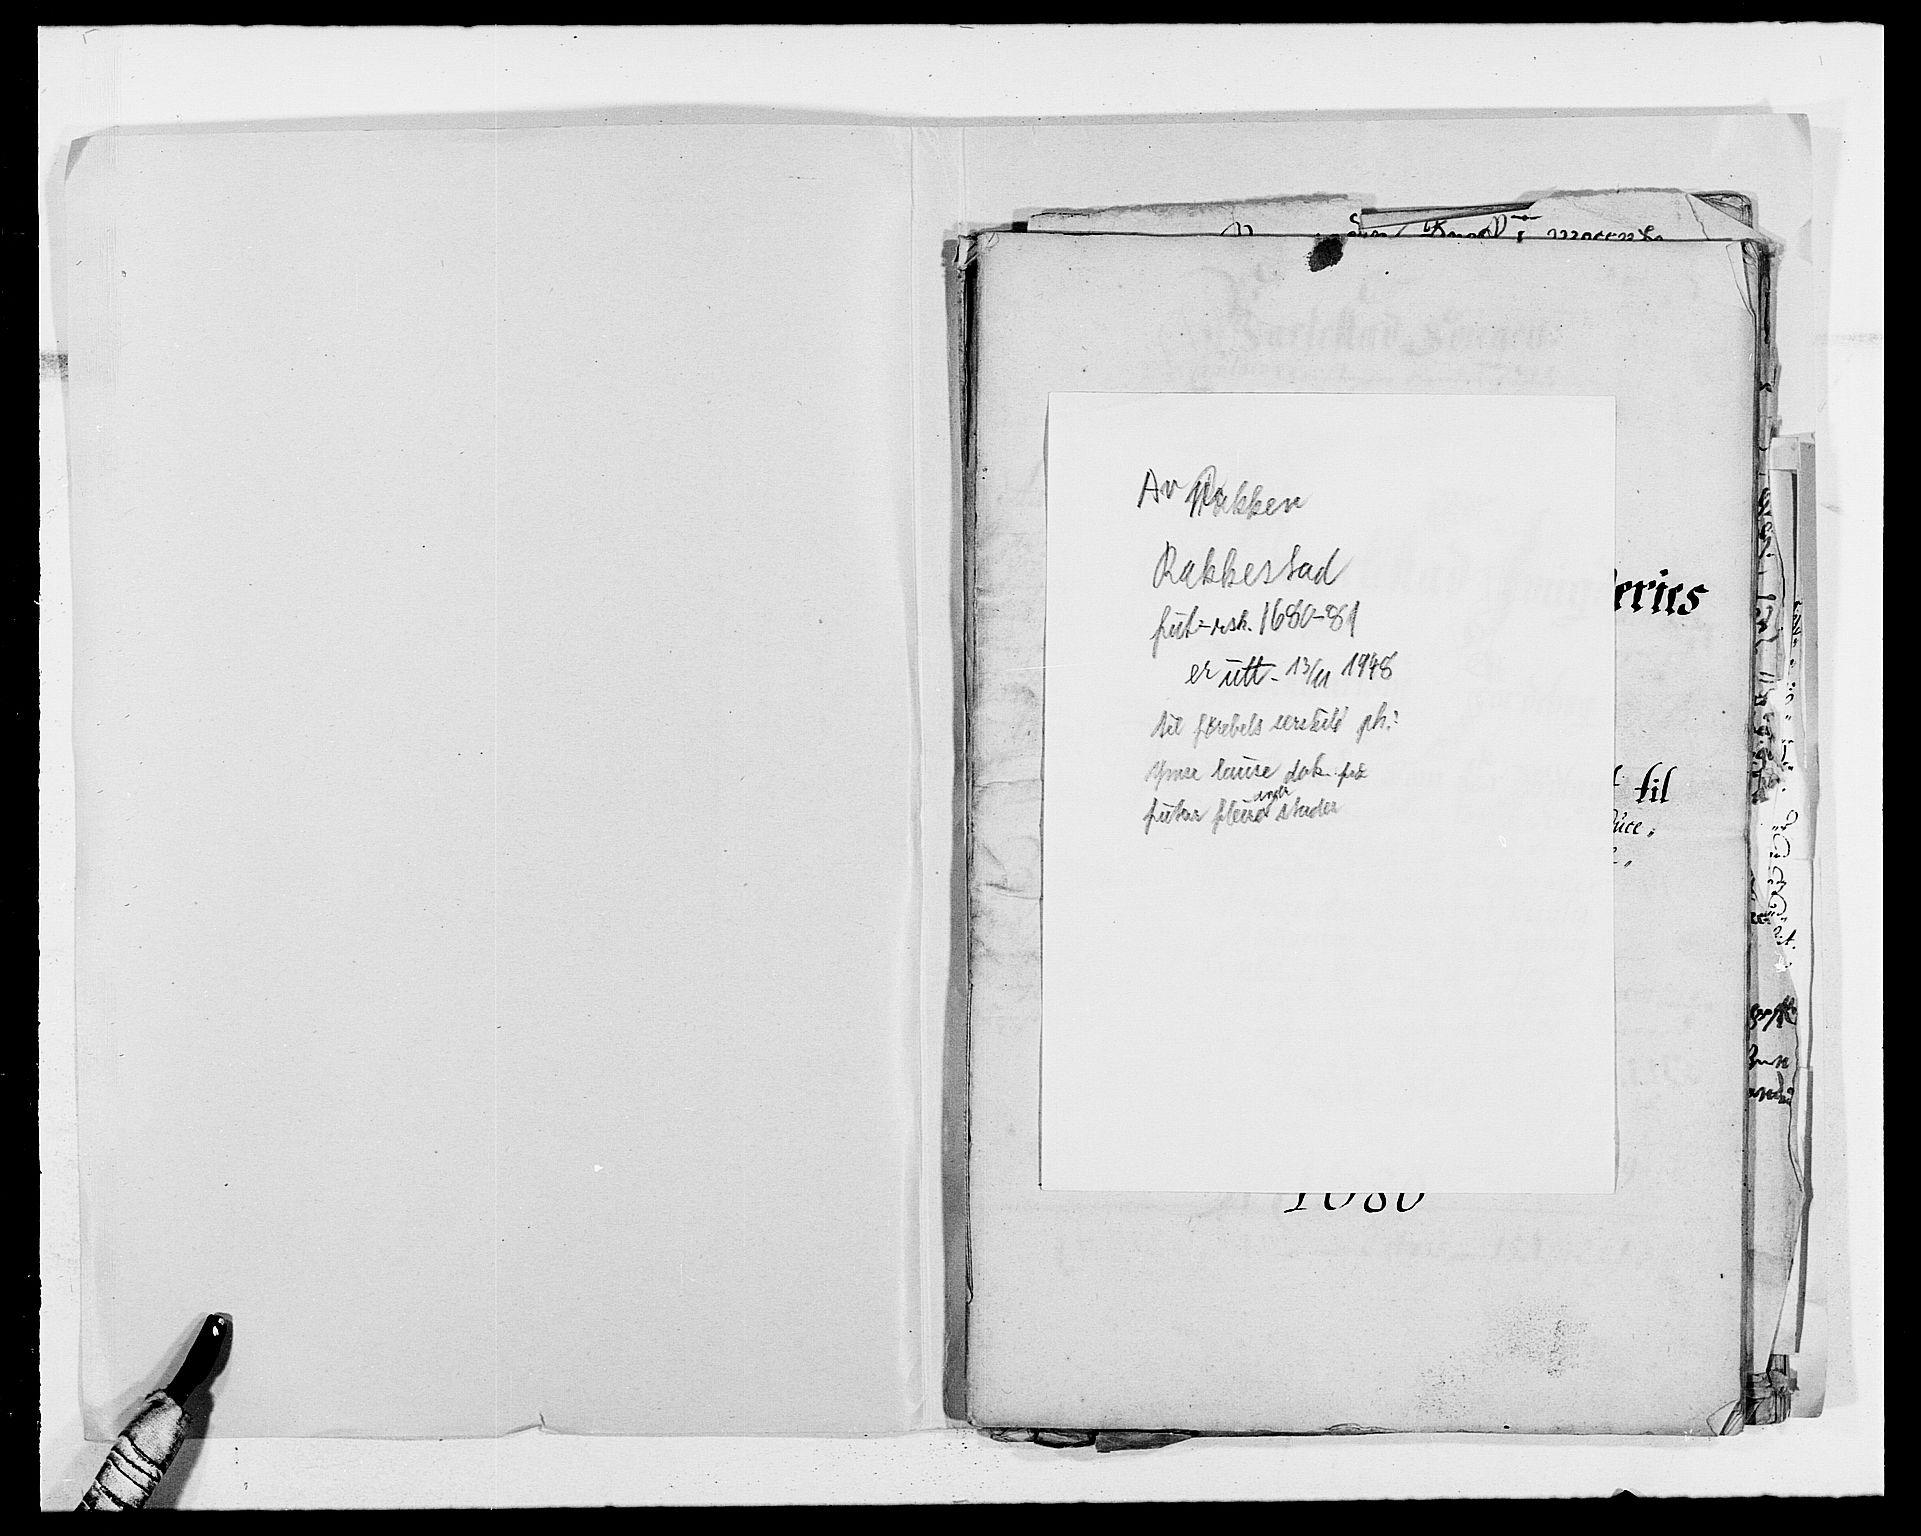 RA, Rentekammeret inntil 1814, Reviderte regnskaper, Fogderegnskap, R05/L0272: Fogderegnskap Rakkestad, 1680-1681, s. 403